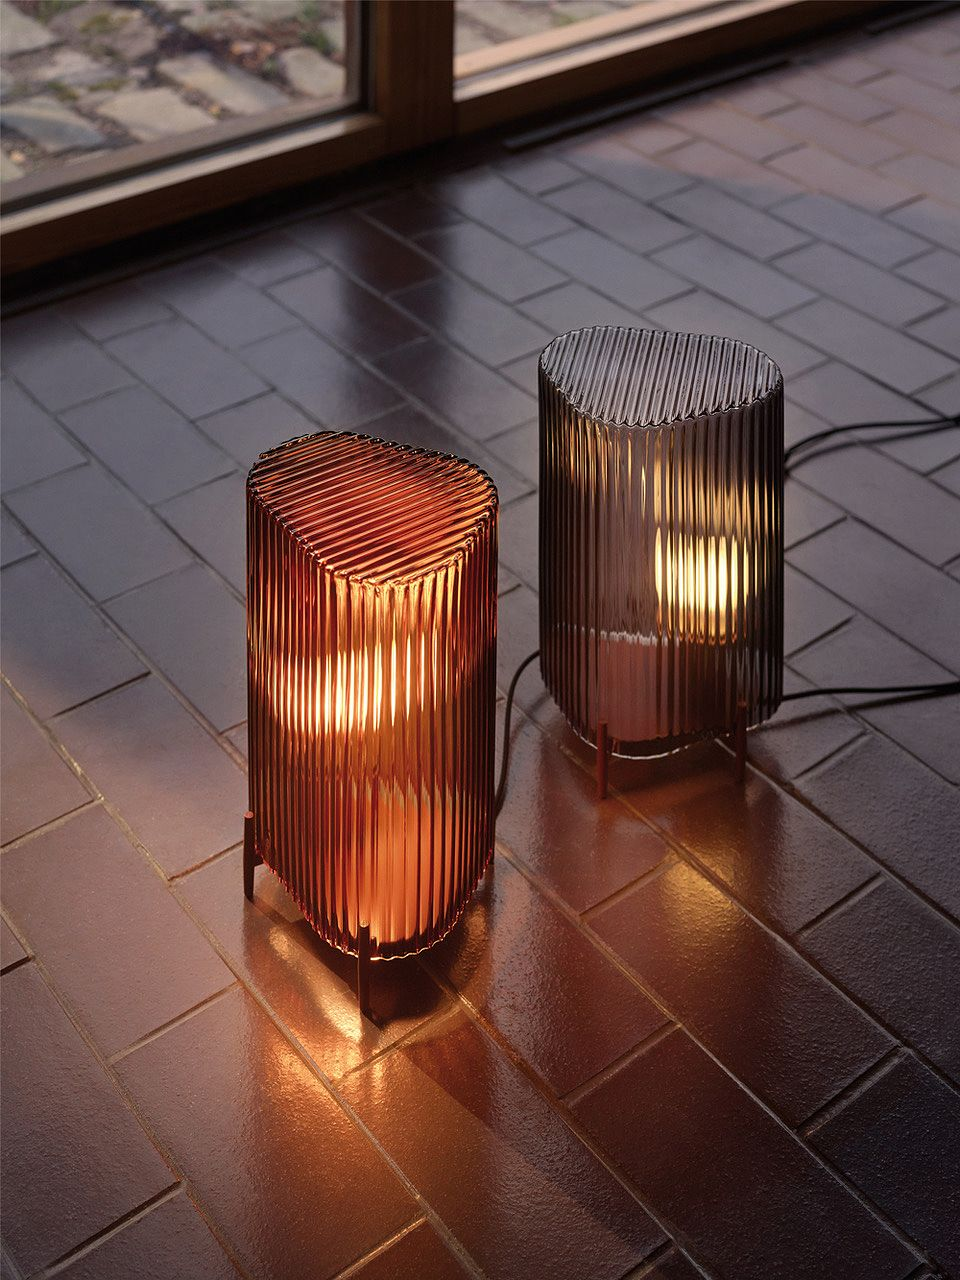 Iittala Putki table lamps